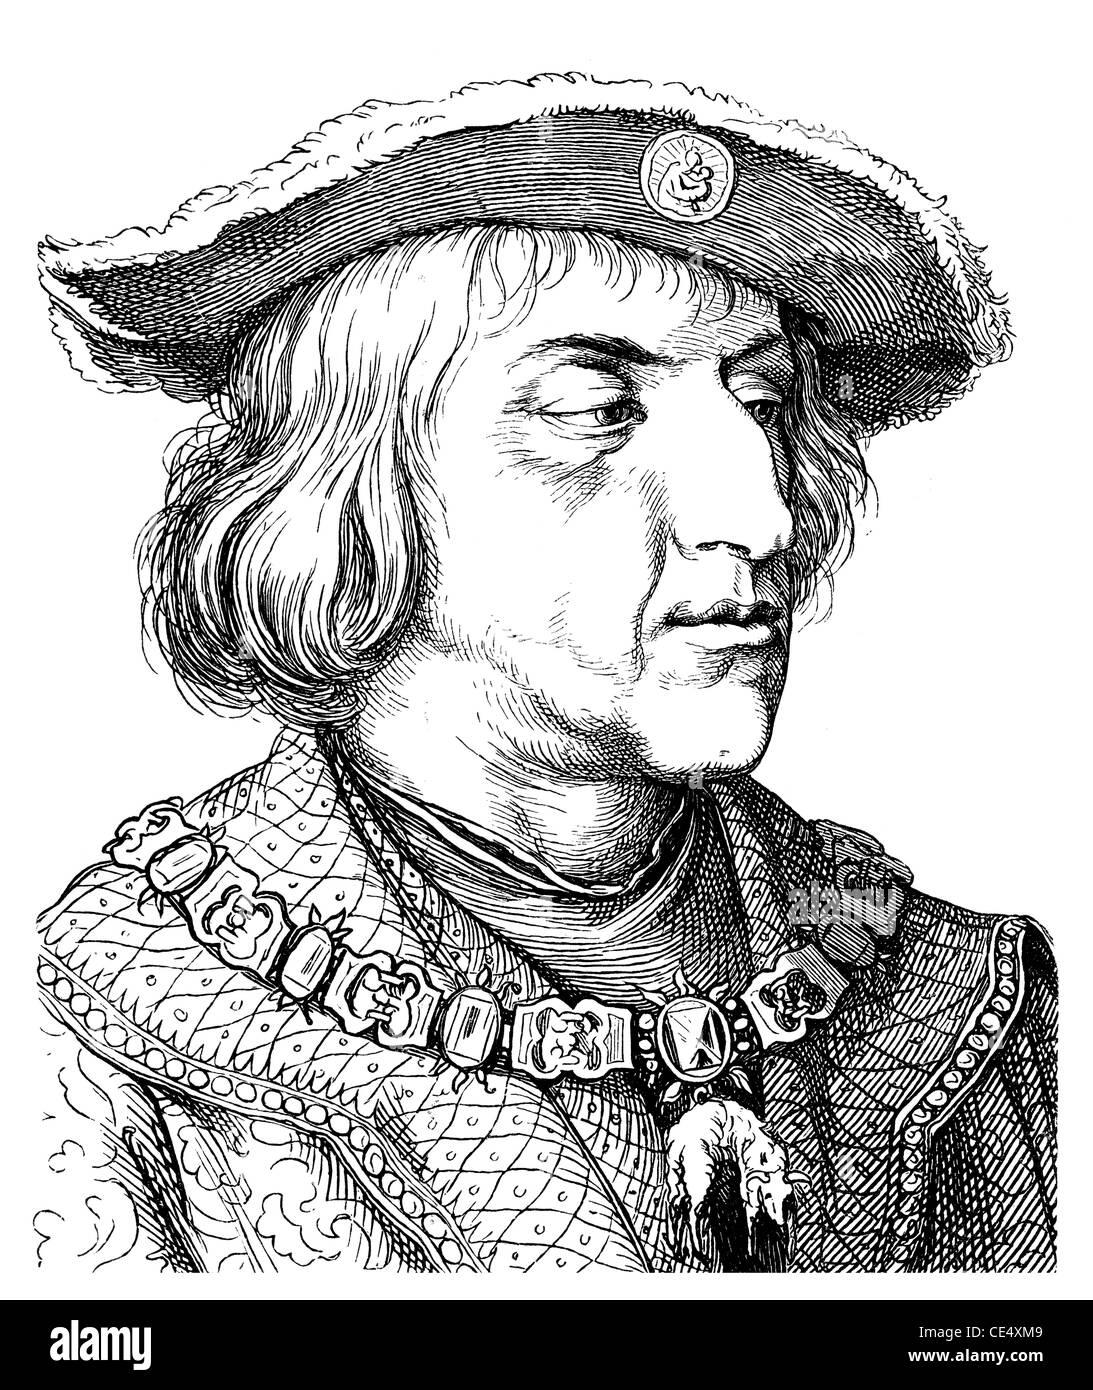 Maximilian I von Habsburg, 1459 -1519, German king, Emperor of the Holy Roman Empire - Stock Image